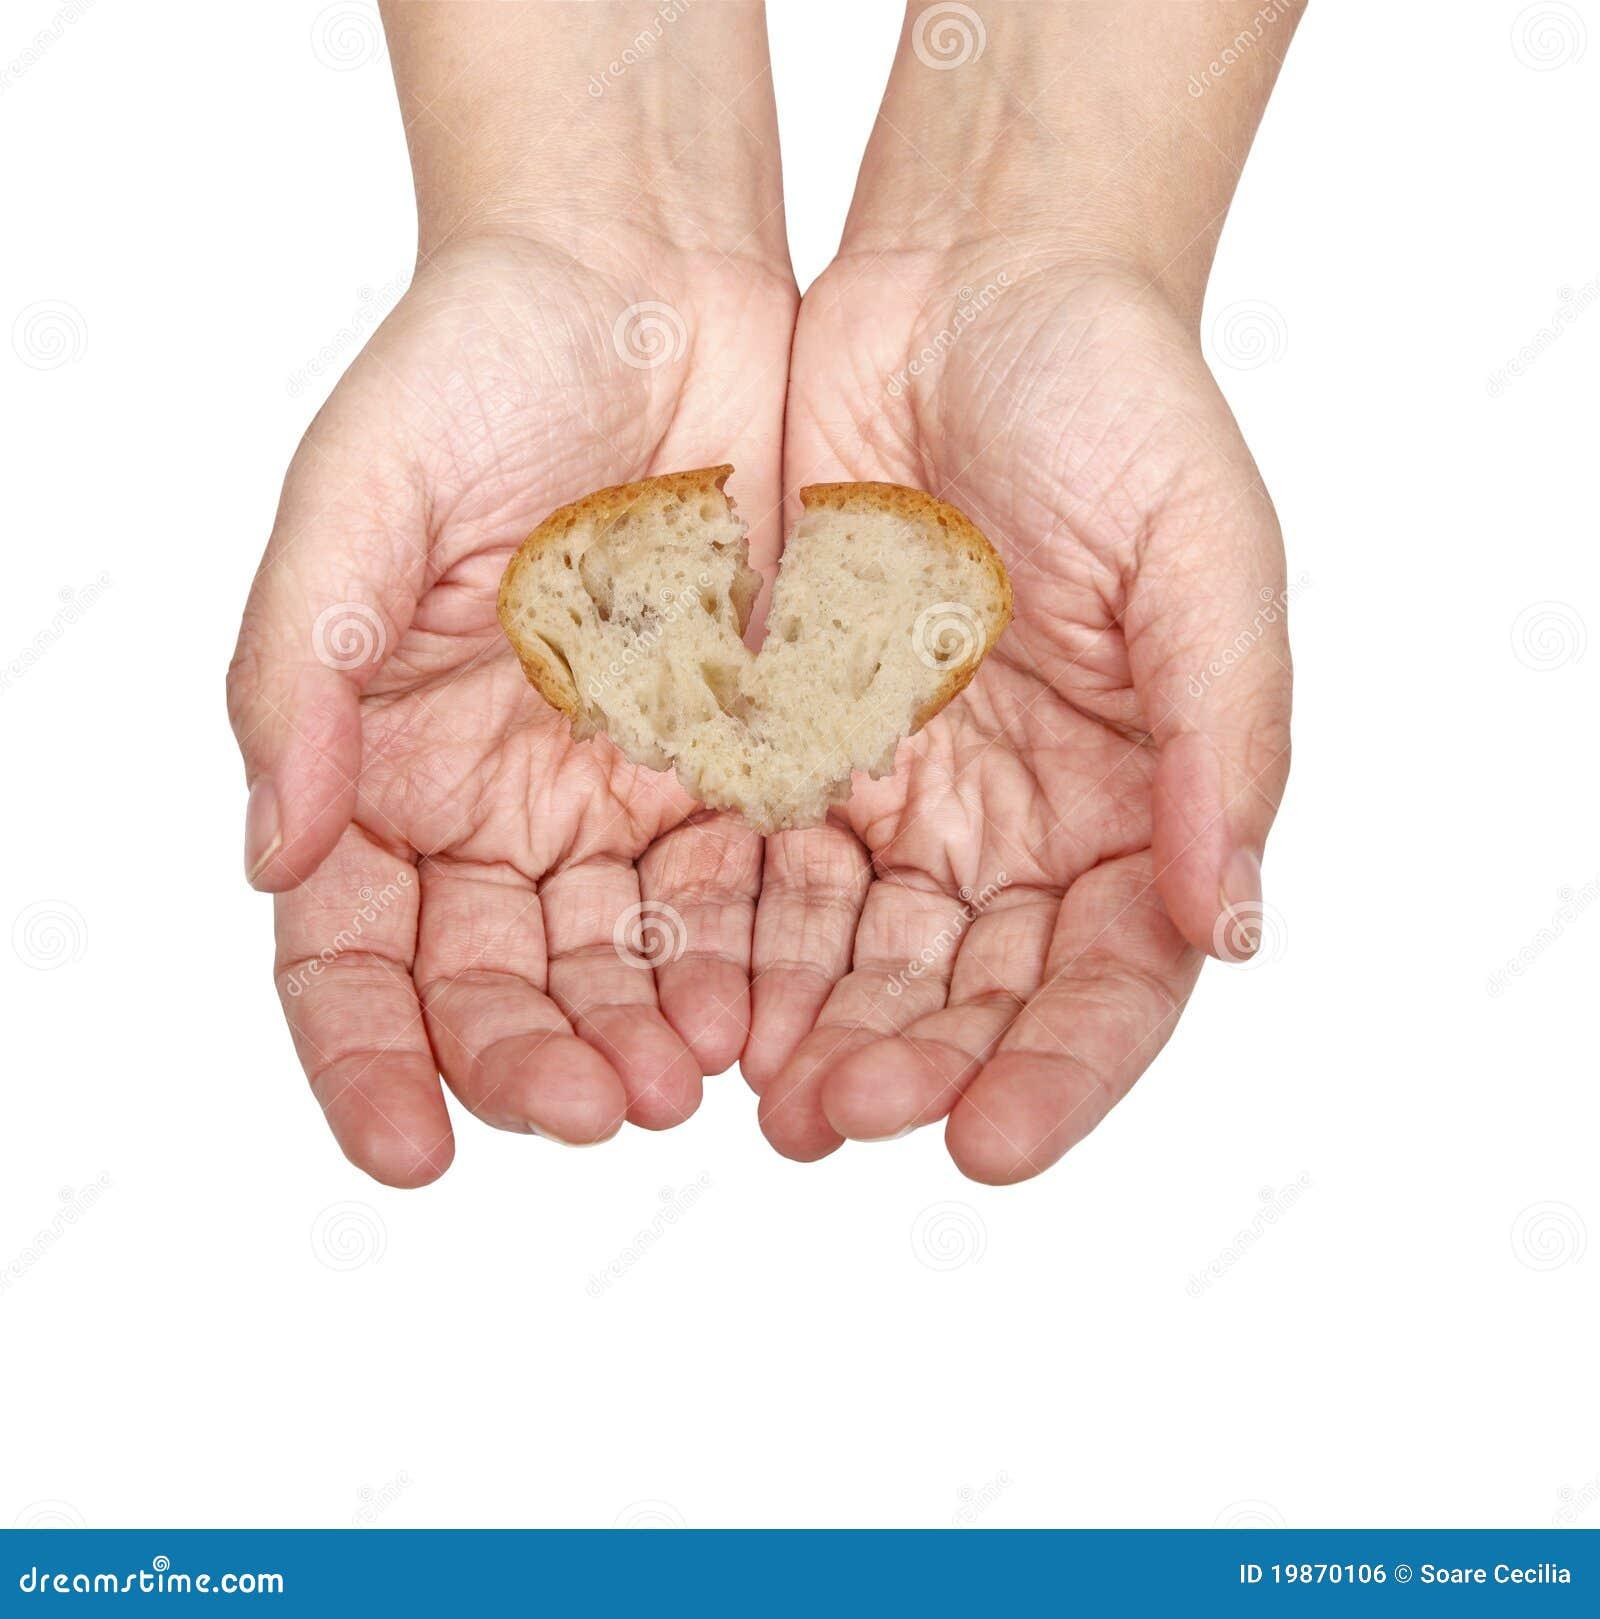 Open beggar hands stock photo. Image of palmistry, hand ...  Open beggar han...